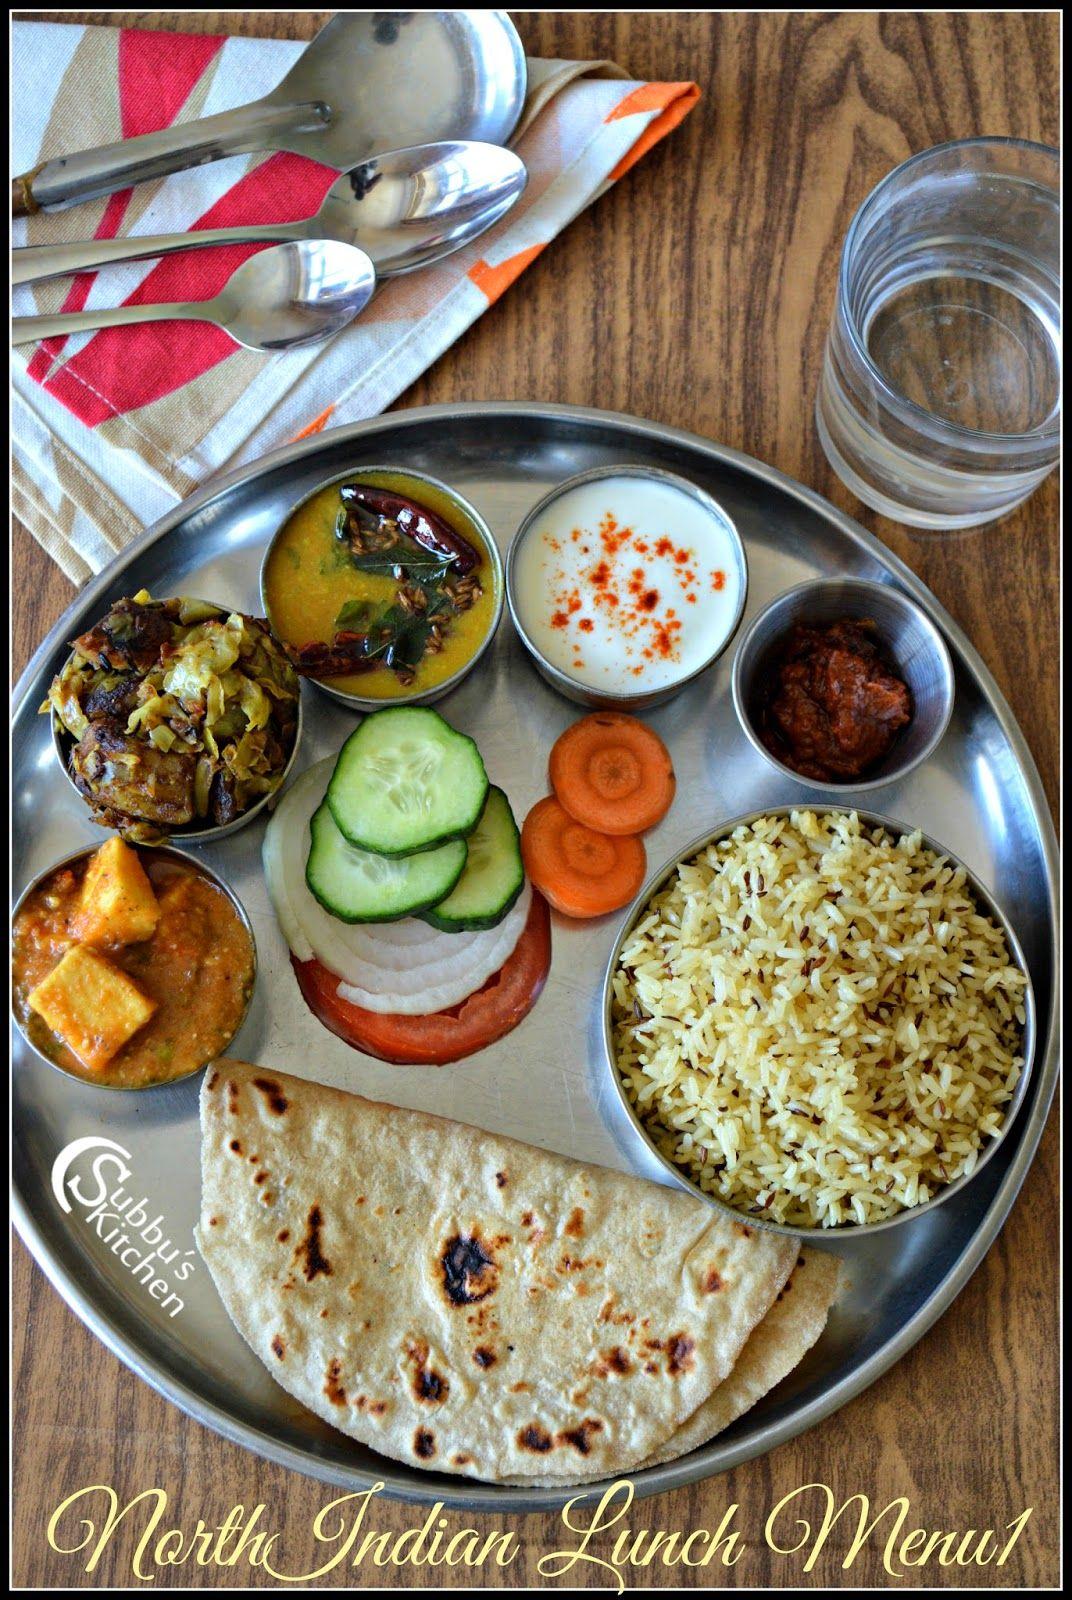 North indian lunch menu 1 chapati dal tadka mutter paneer aloo north indian lunch menu 1 chapati dal tadka mutter paneer aloo pattagobhi indian food vegetarianindian food recipesindian forumfinder Gallery